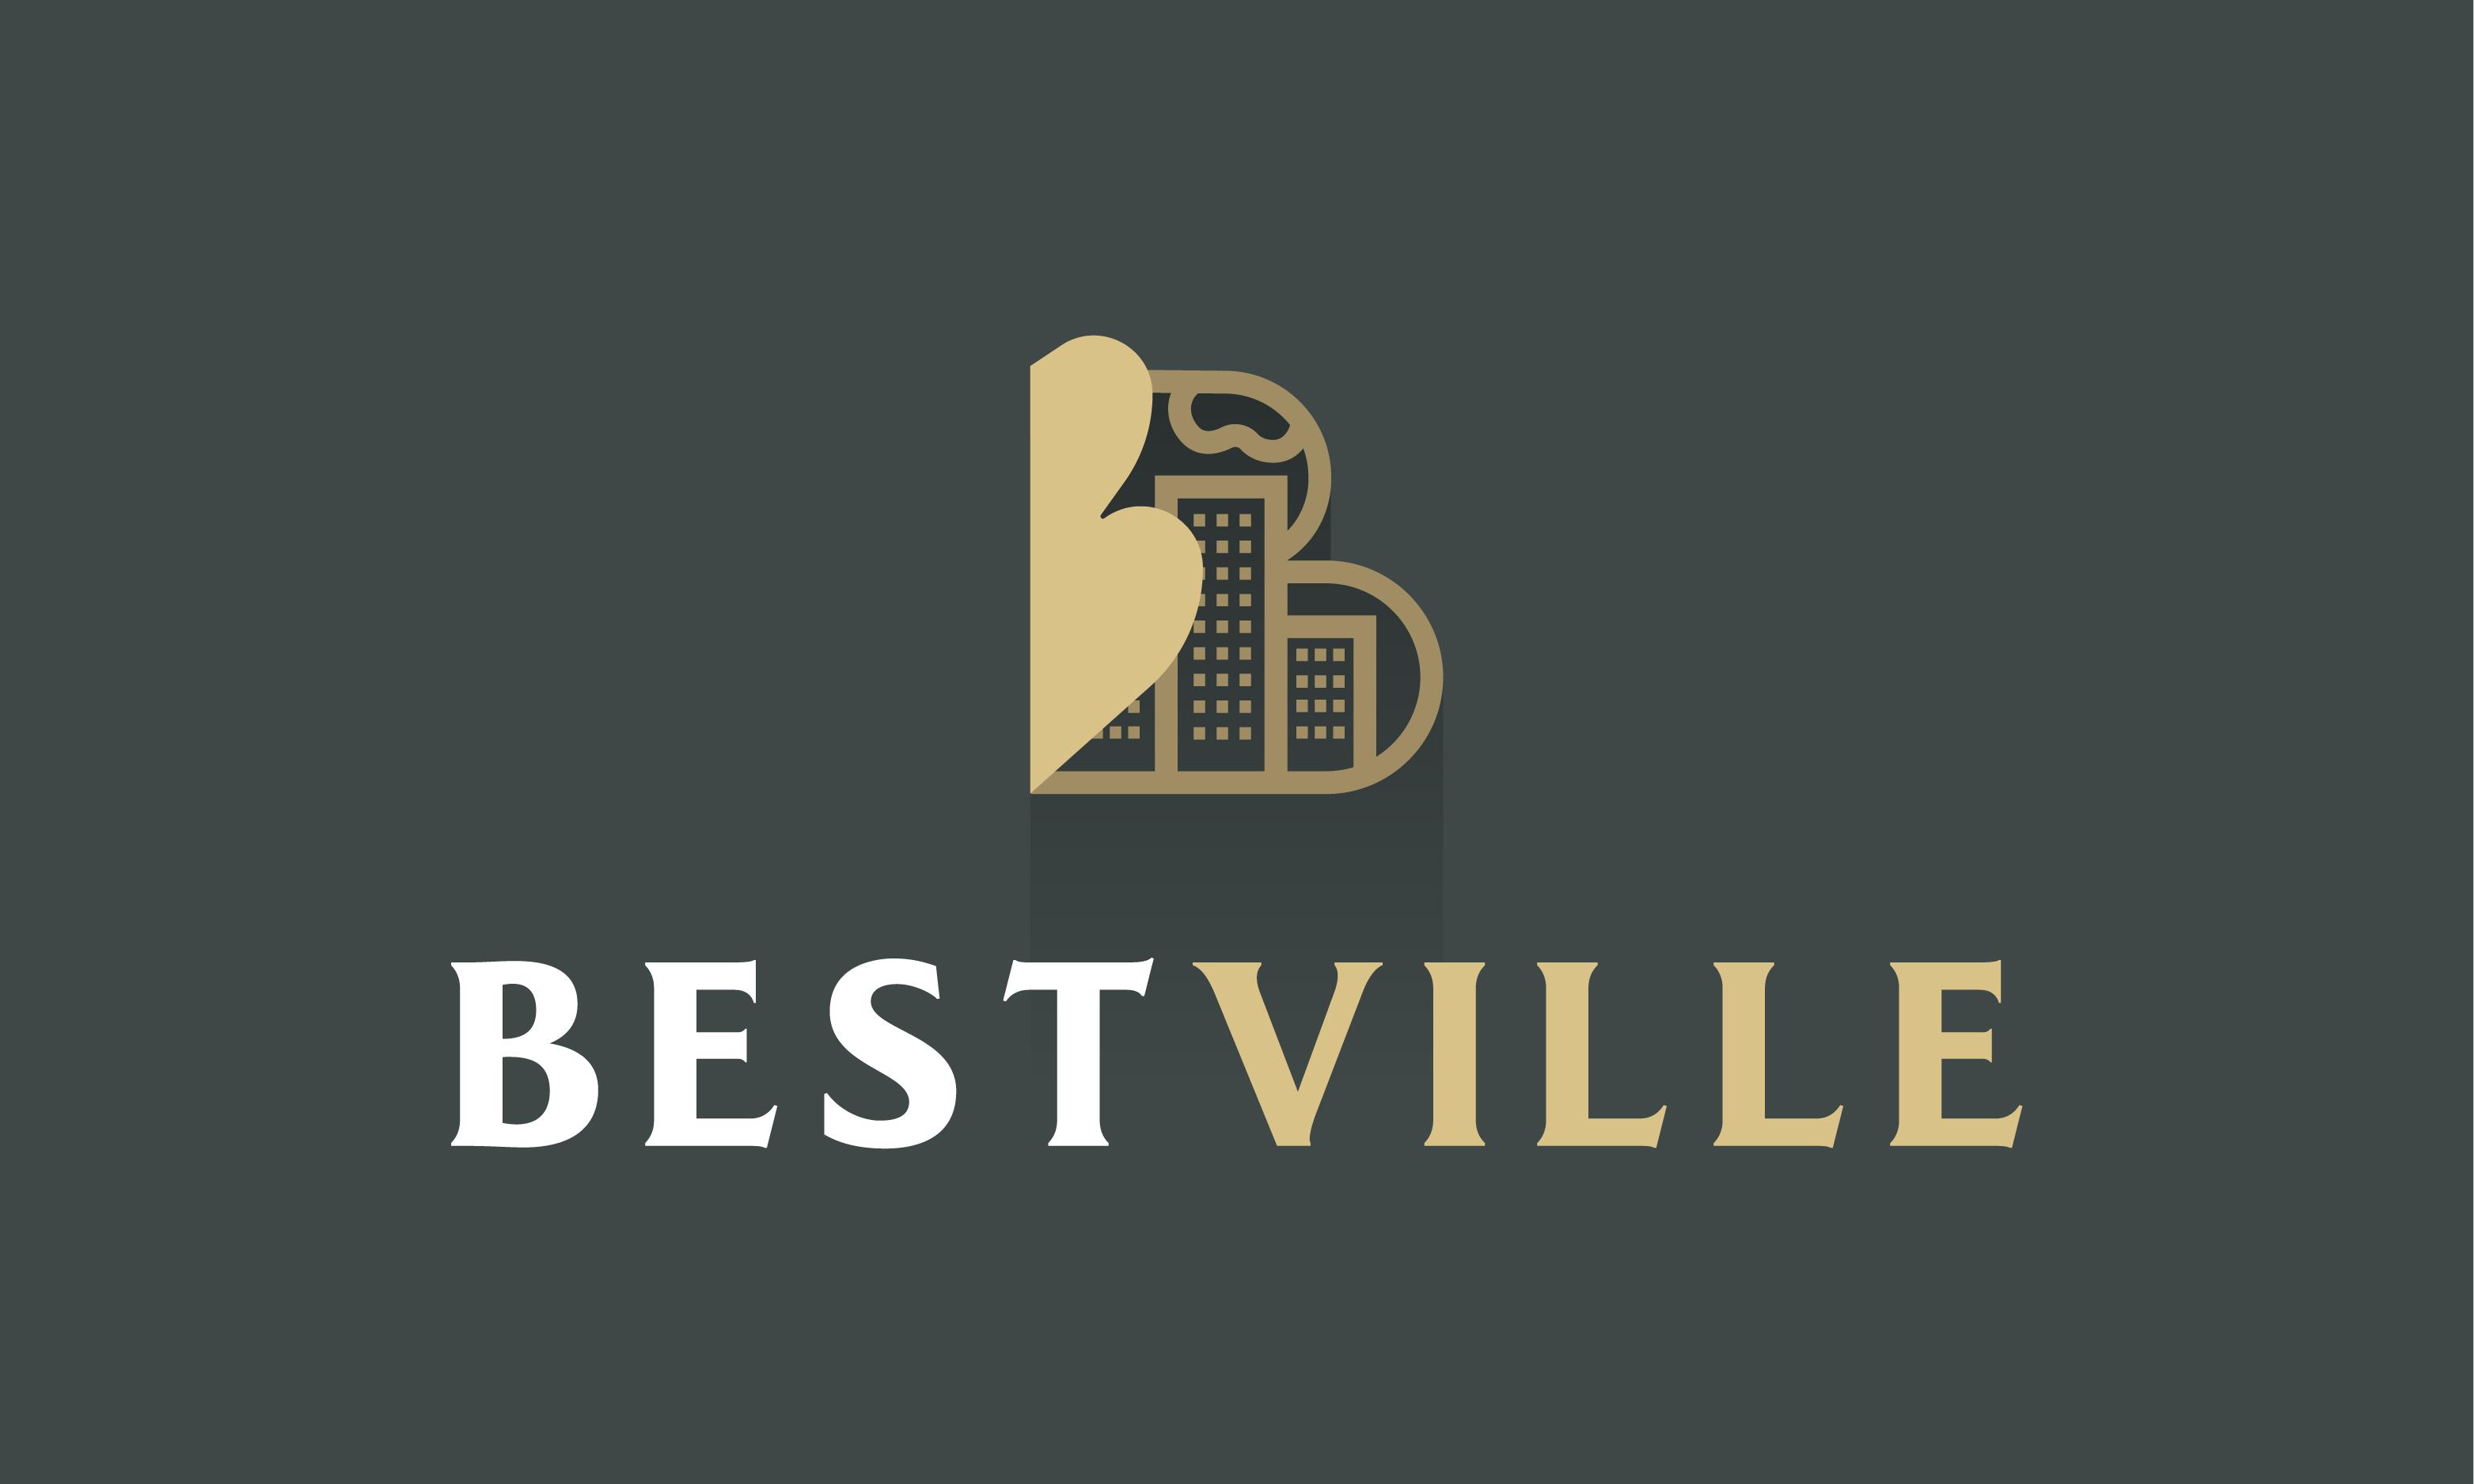 BestVille.com